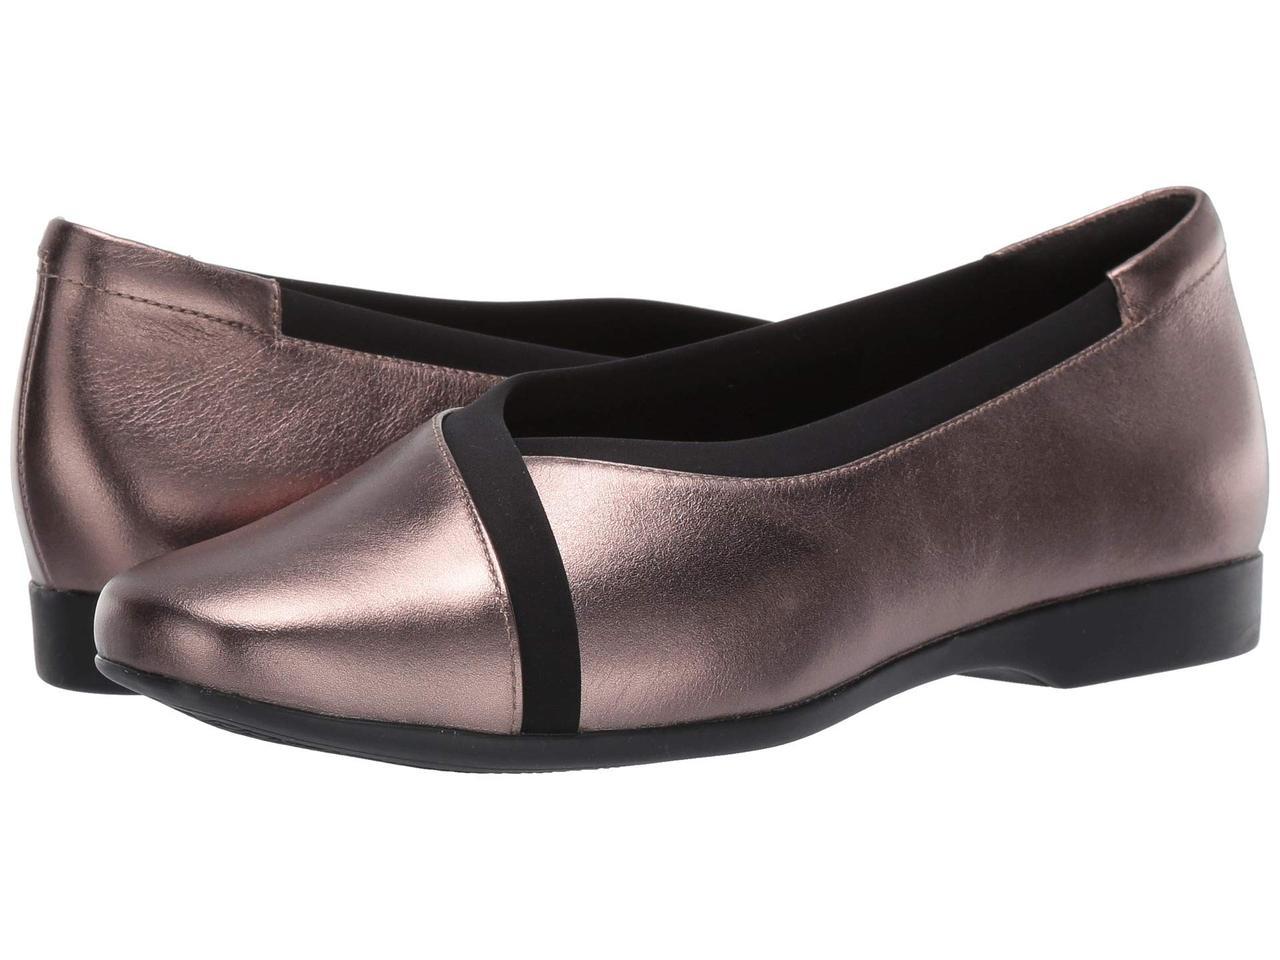 Туфли без каблука (Оригинал) Clarks Un Darcey Ease Pebble Metallic Leather